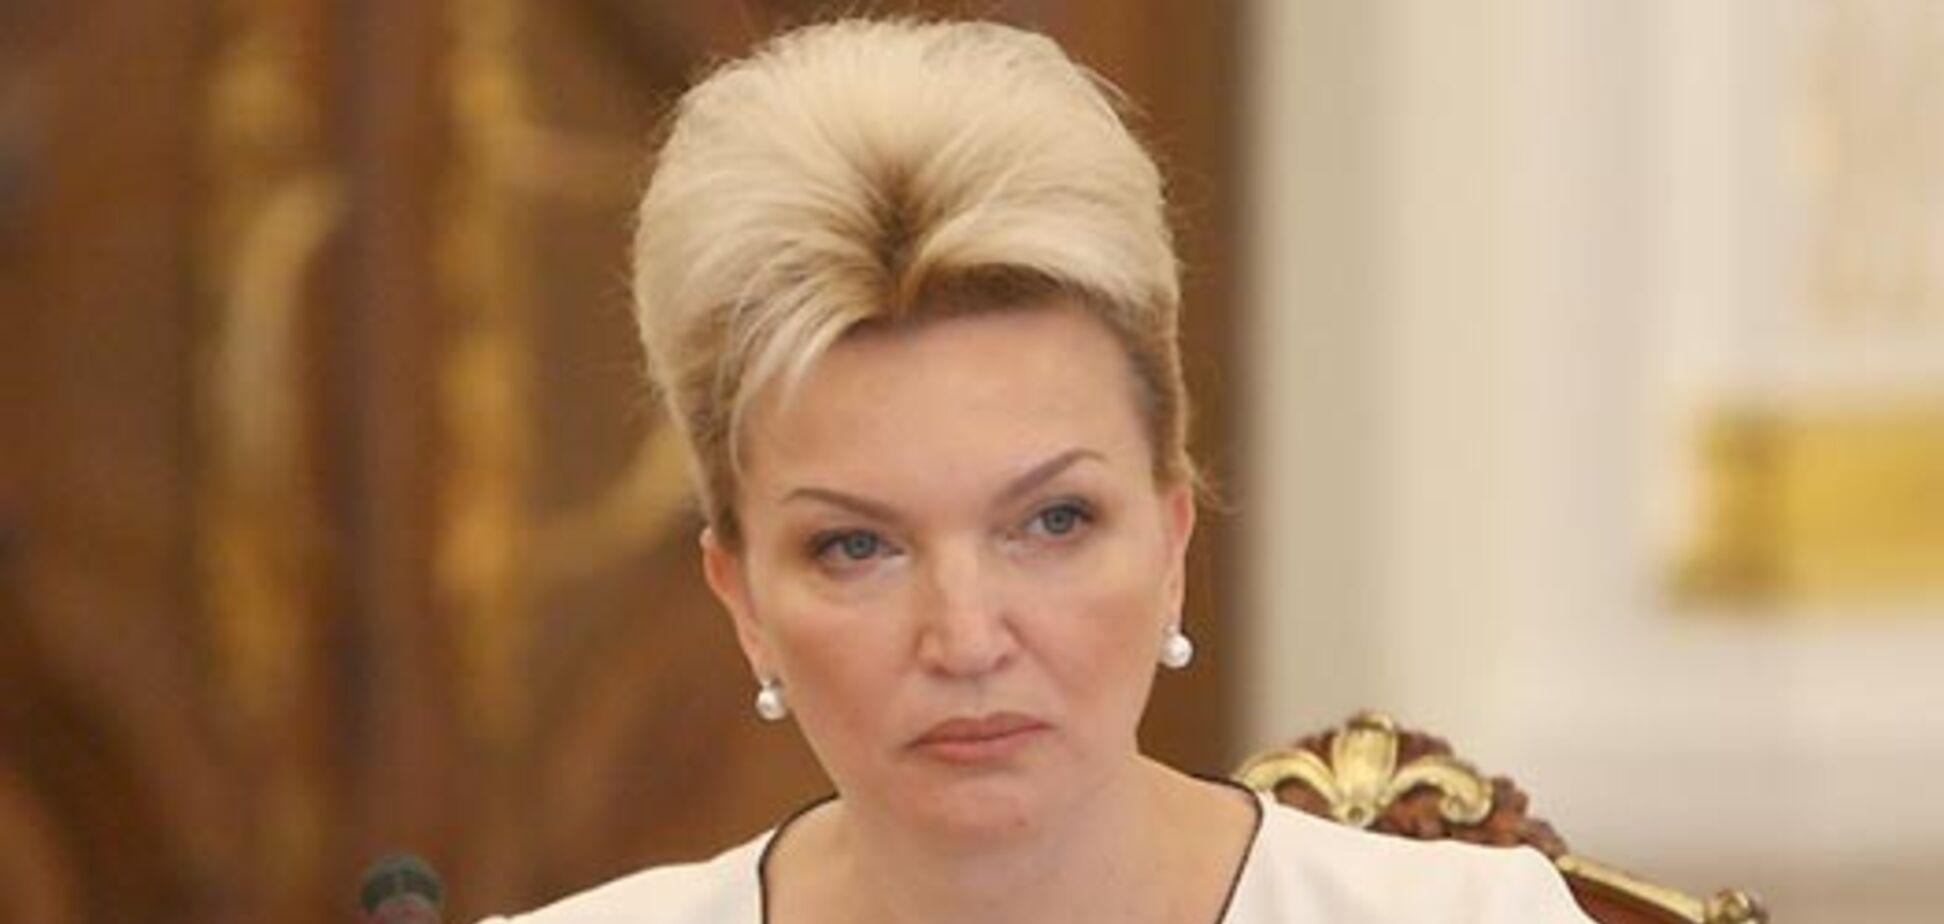 Раису Богатыреву взяли под стражу на 2 месяца